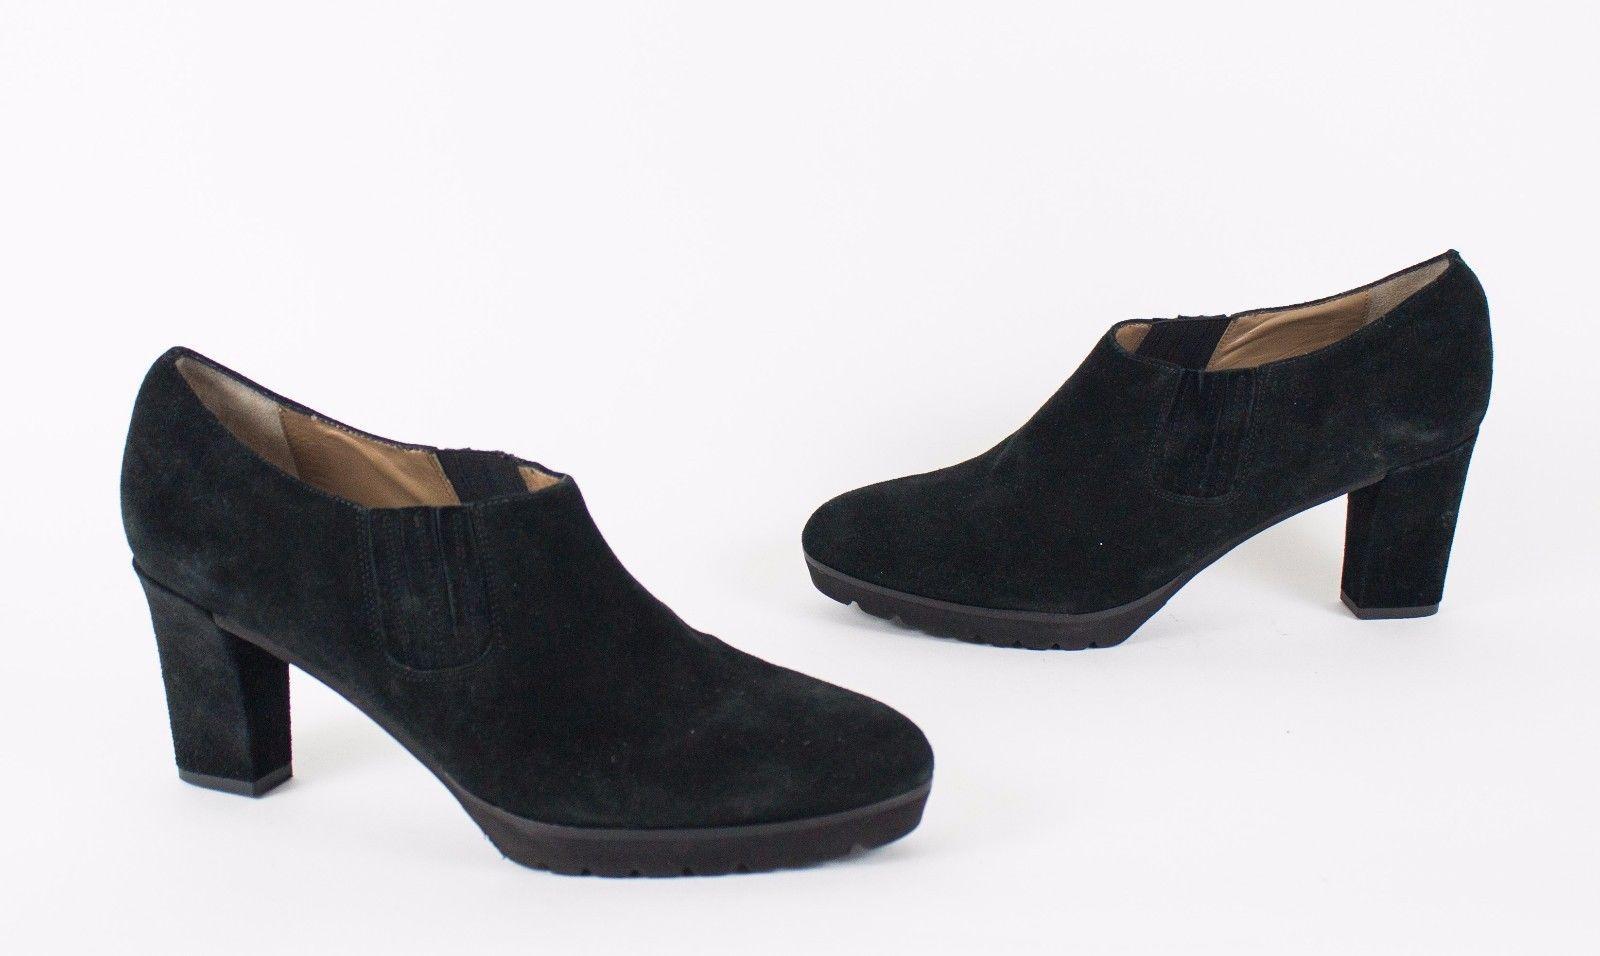 Anyi Lu Natalie Black Suede Women's Ankle Bootie EU 41.5 US 11